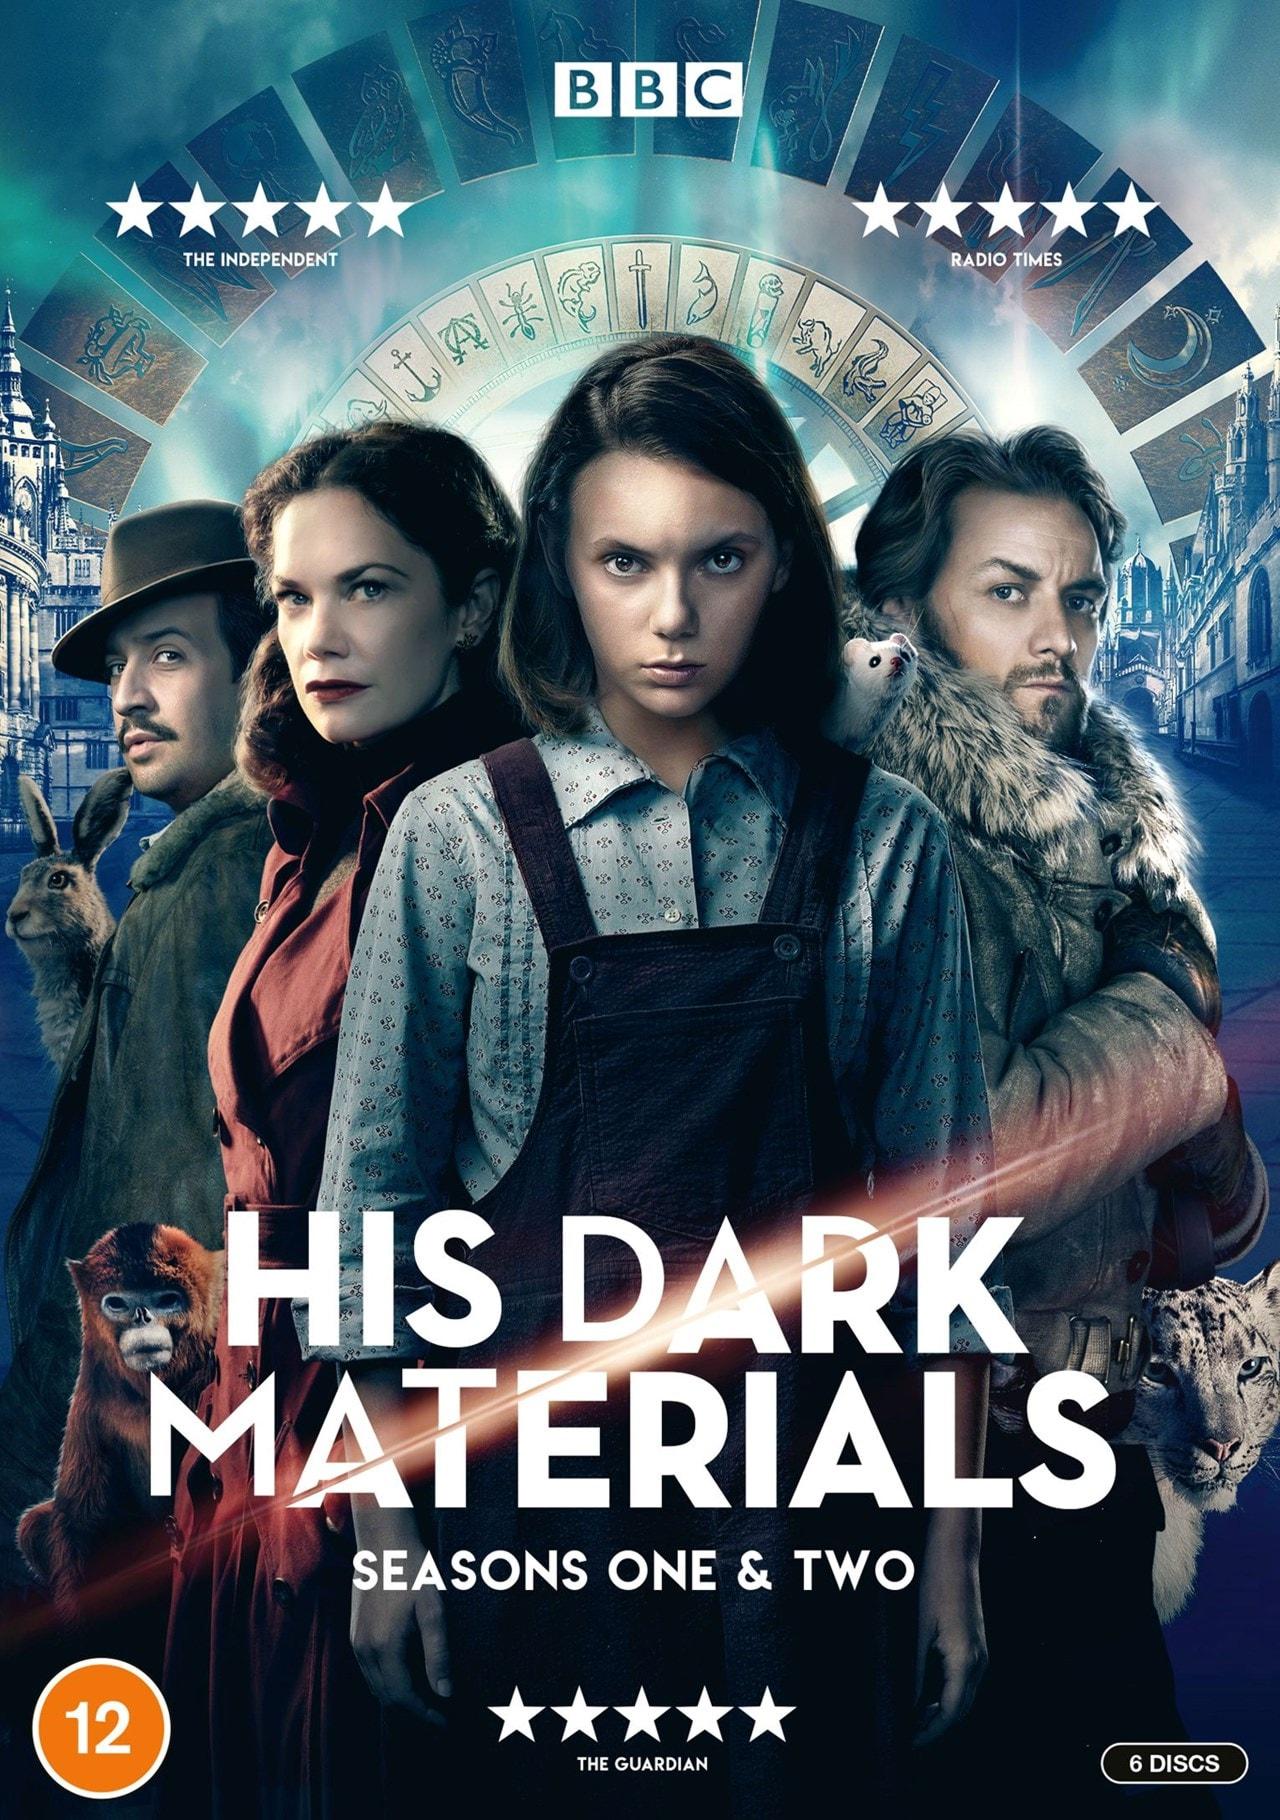 His Dark Materials: Season One & Two - 1